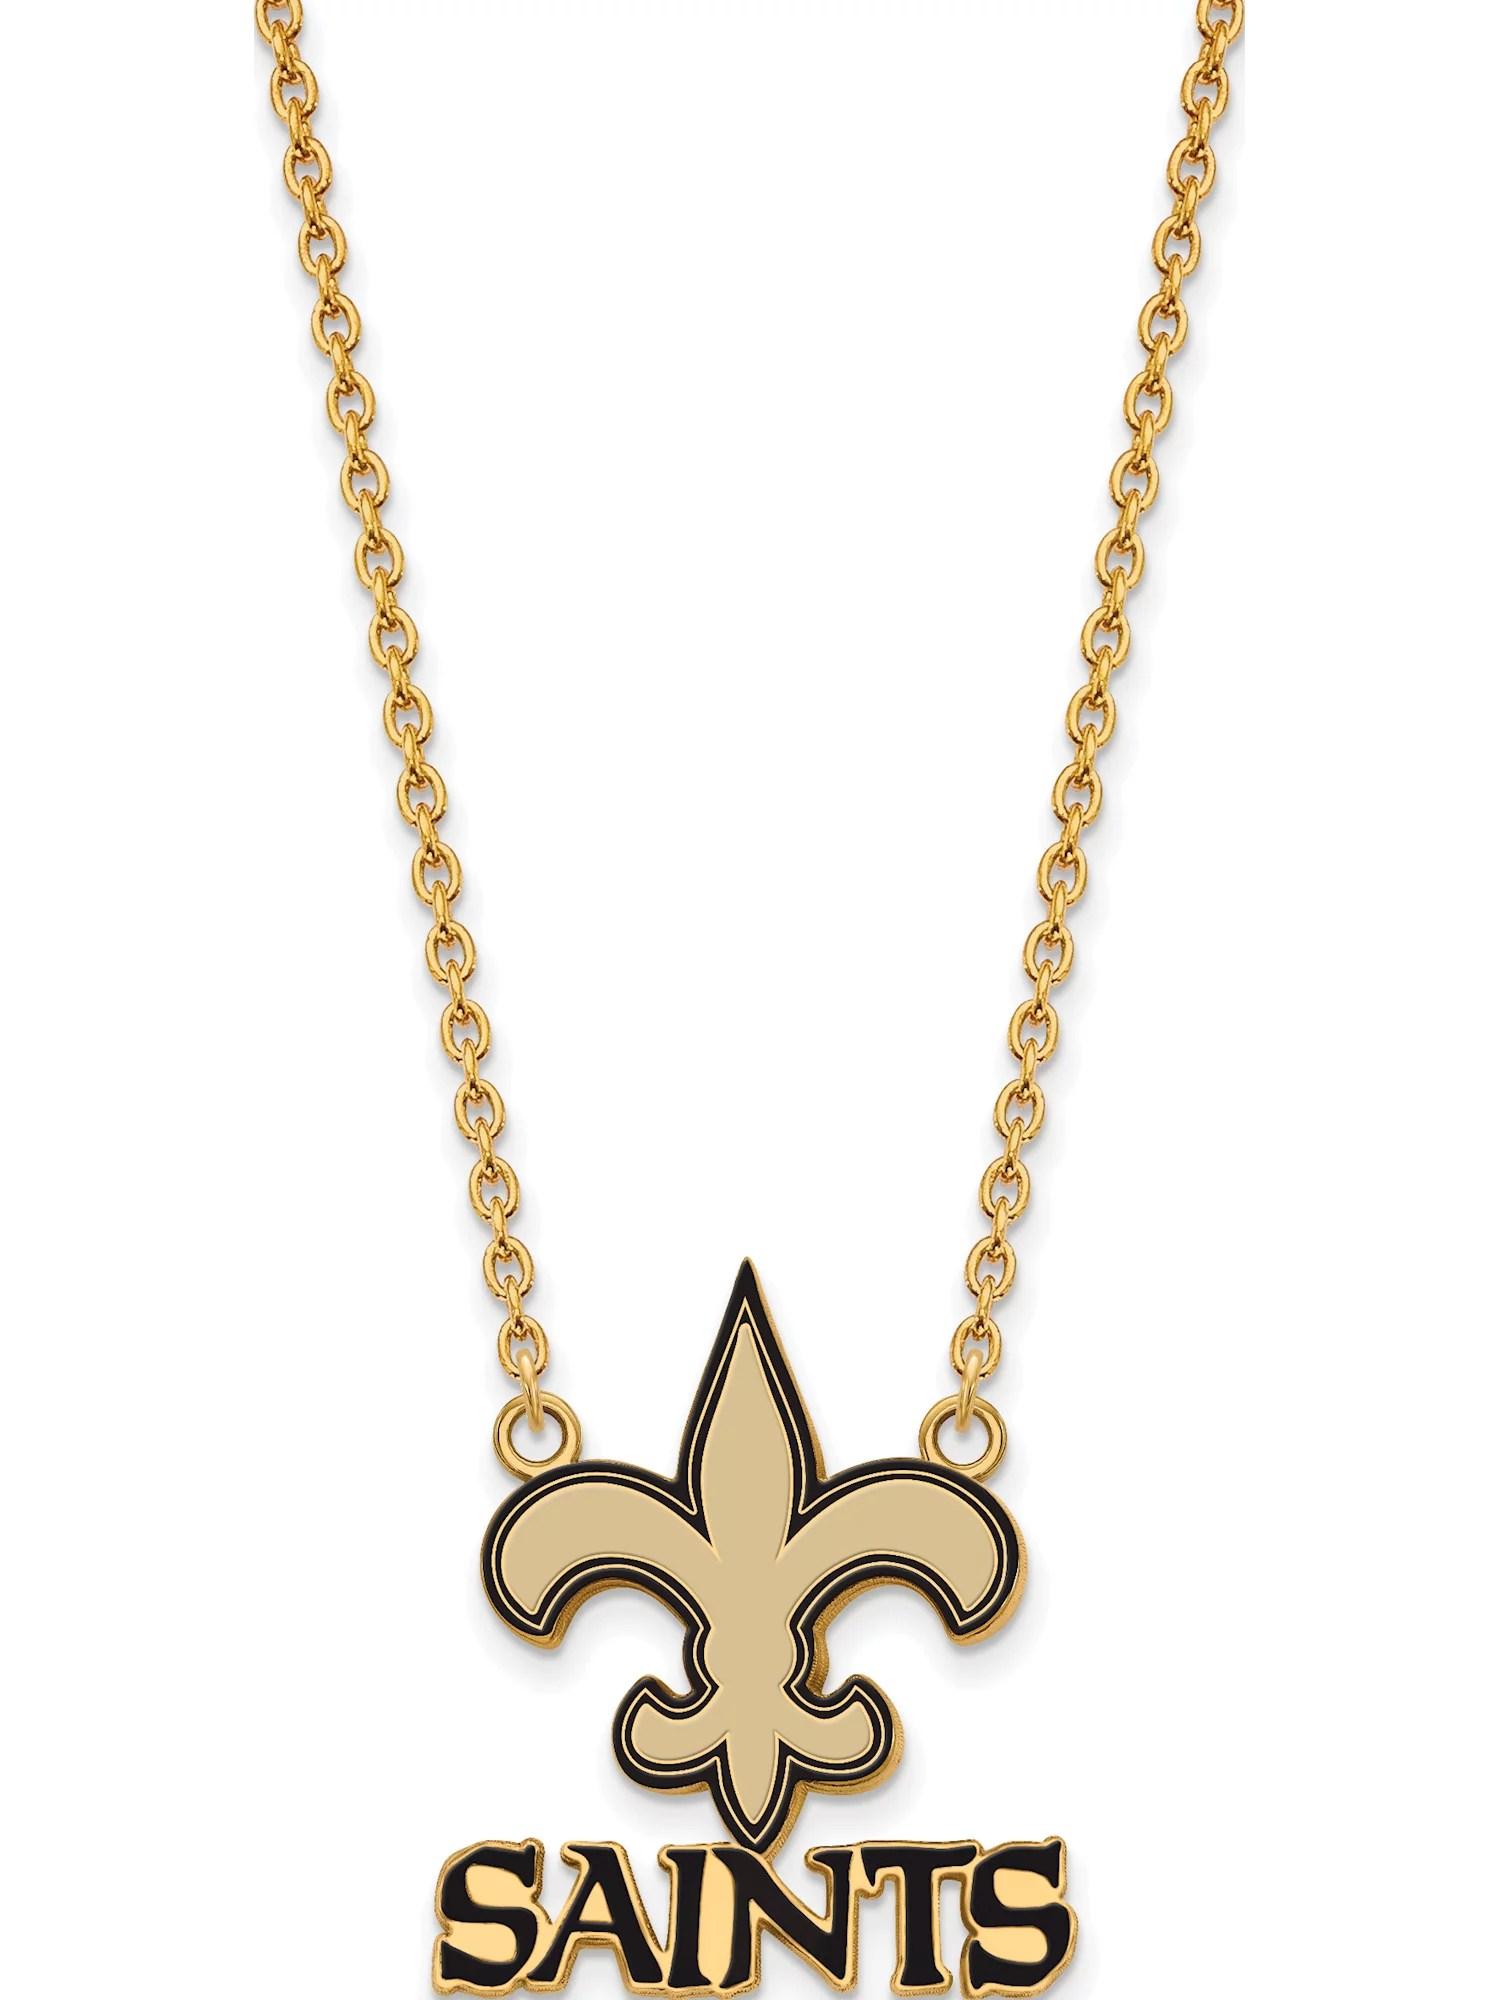 New Orleans Saints Jewerly : orleans, saints, jewerly, Orleans, Saints, Large, Pendant, Necklace, Walmart, Canada